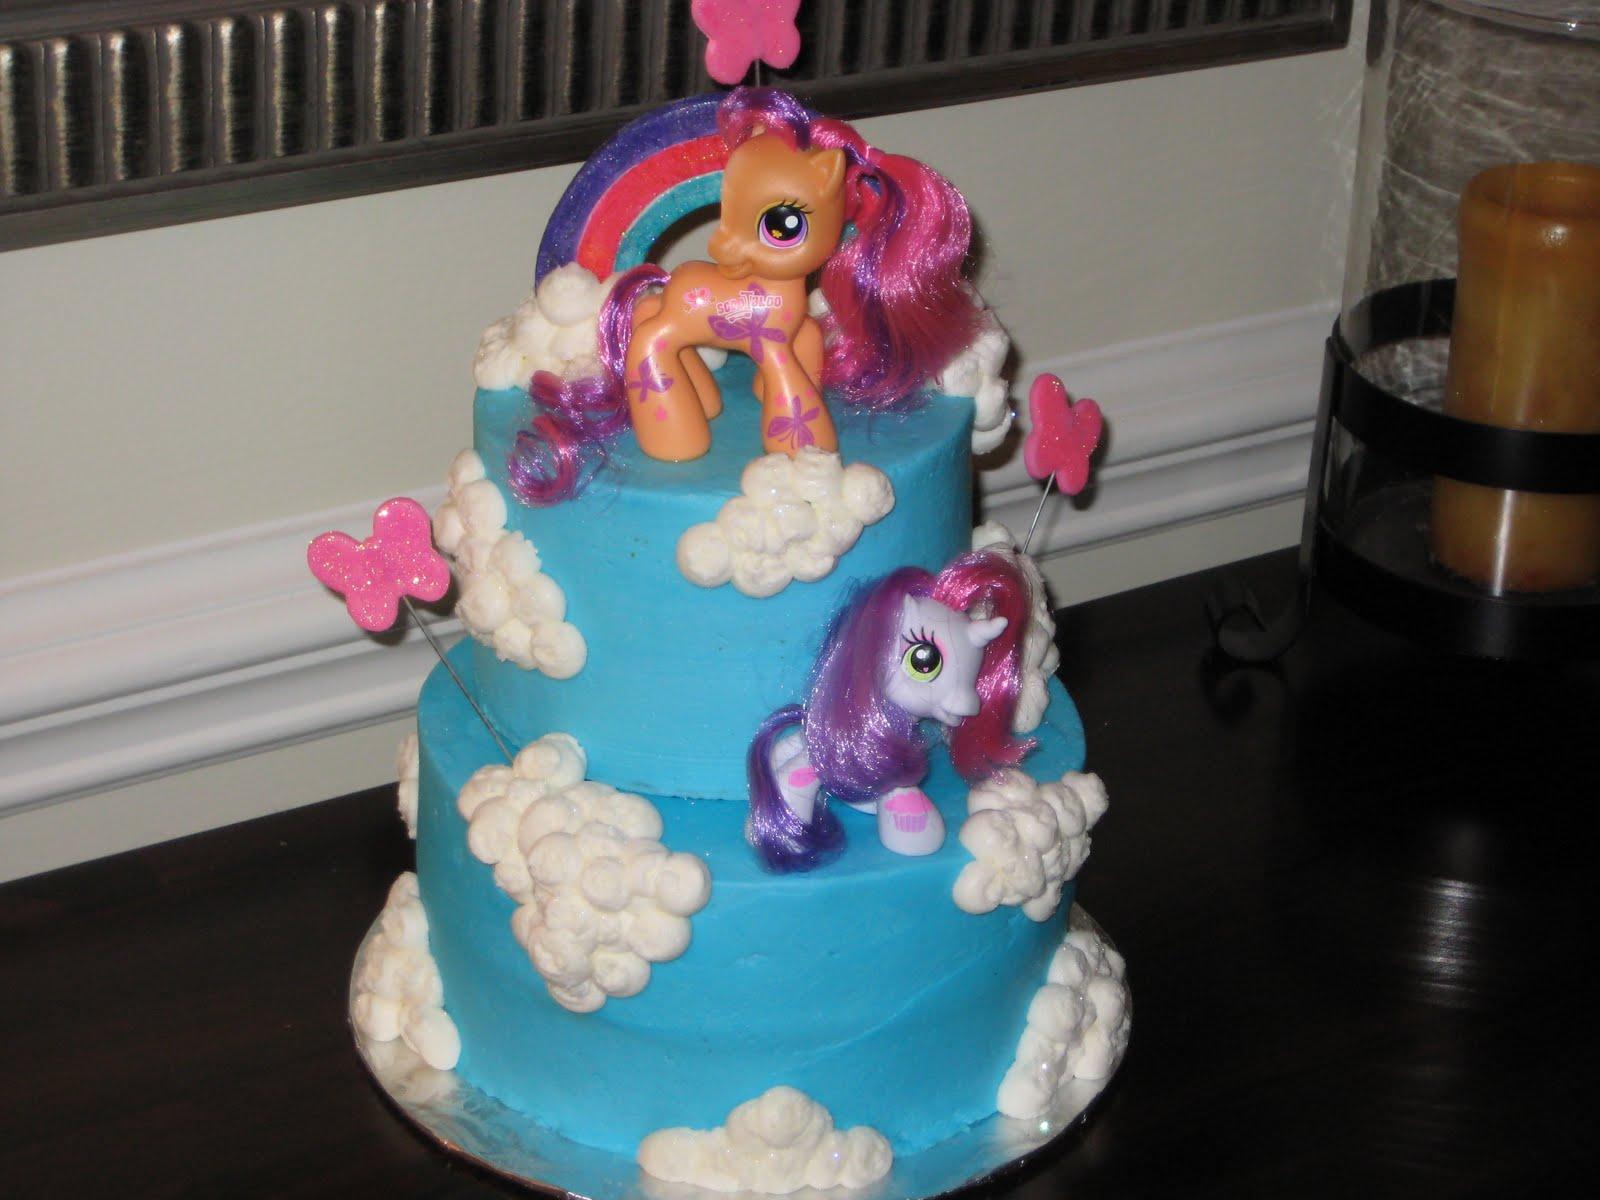 My Little Pony Birthday Cake Kroger Image Inspiration of Cake and